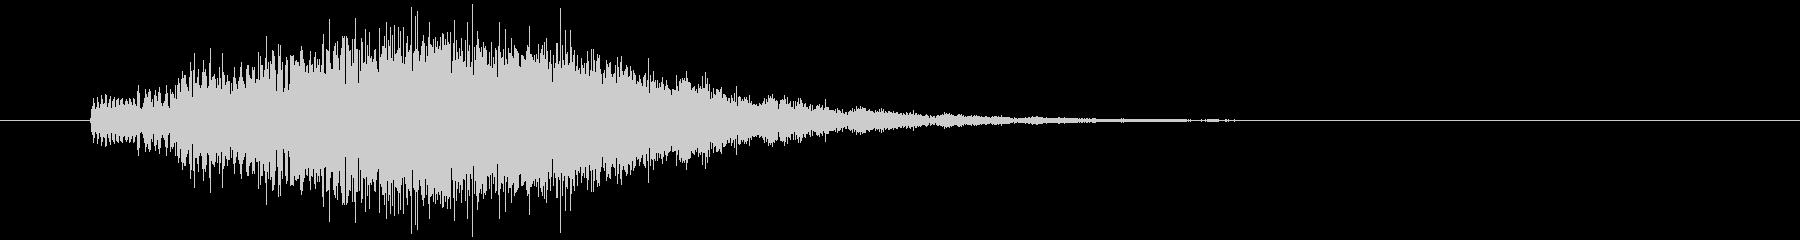 Bell_gliss_m0231の未再生の波形